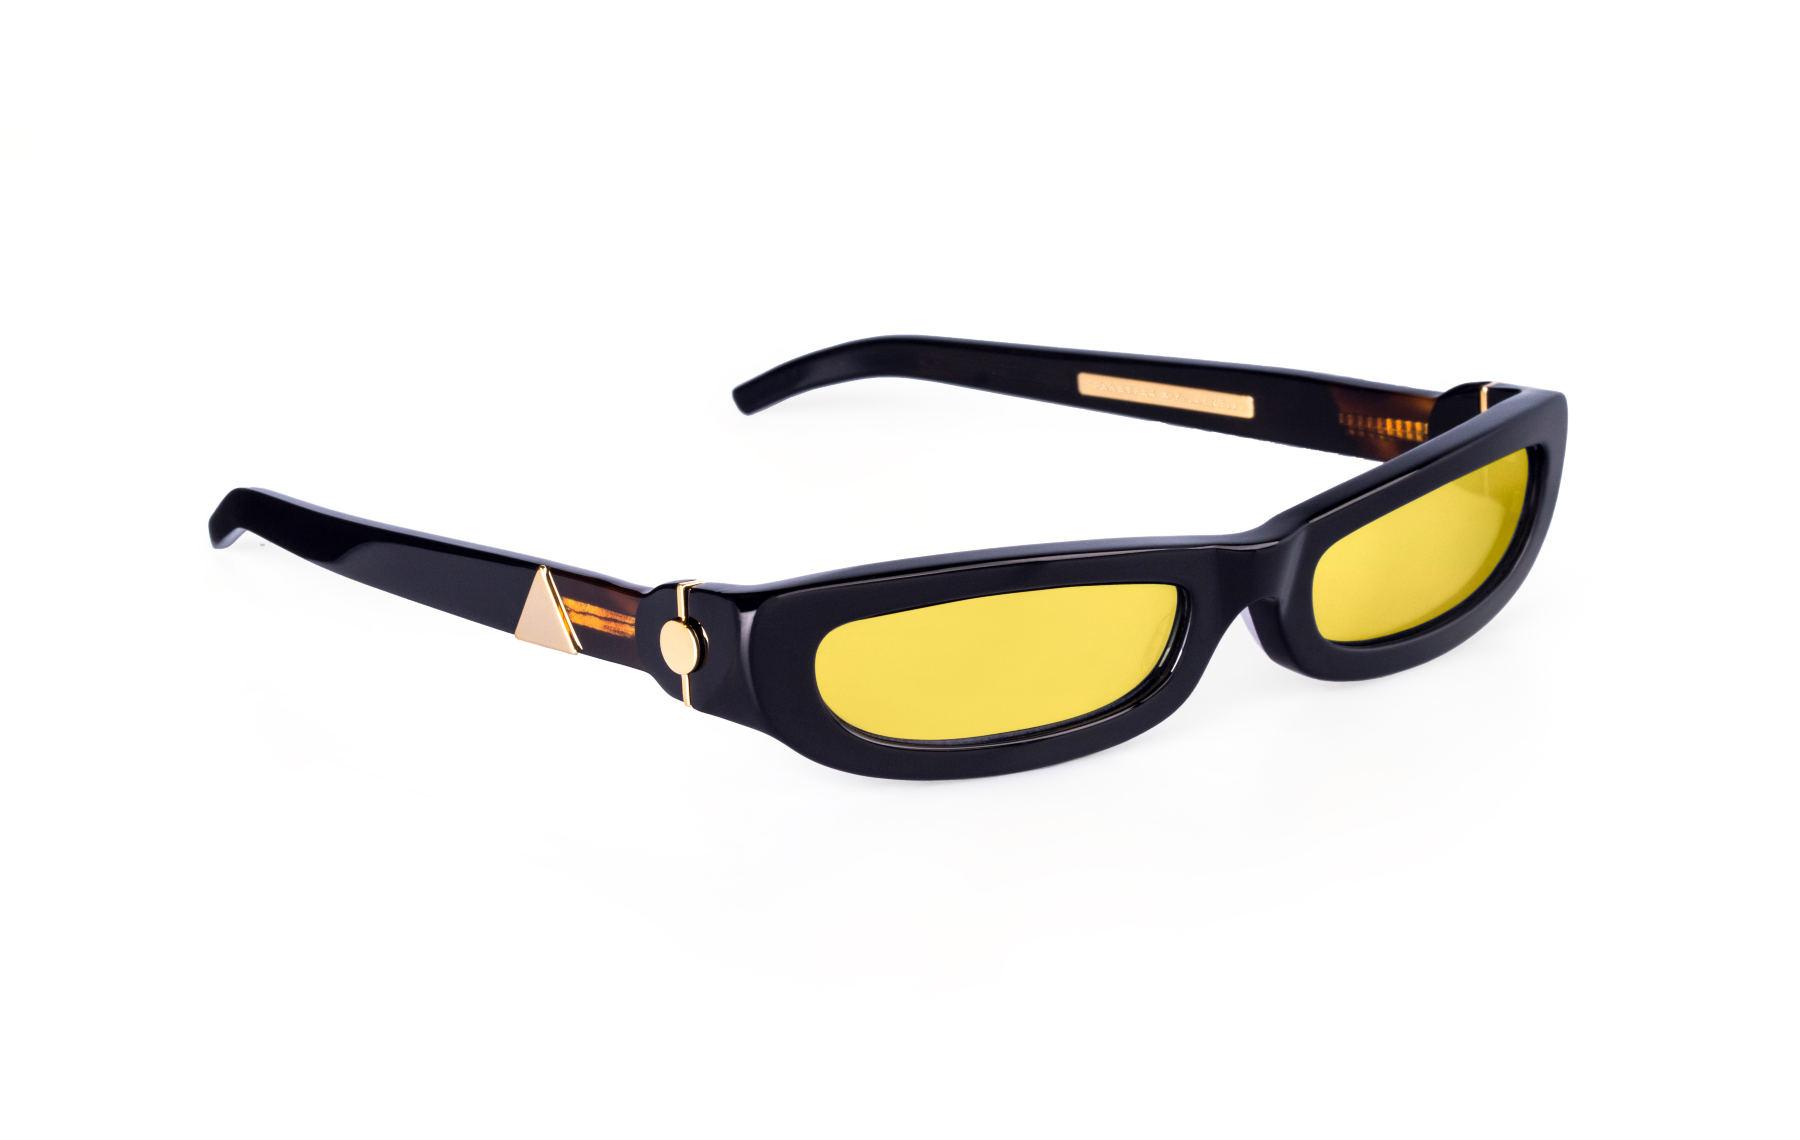 FAKBYFAK x Pilar Zeta  SHARP. Sunglasses. Classic Glossy Black & Gold Code: 14/01/02